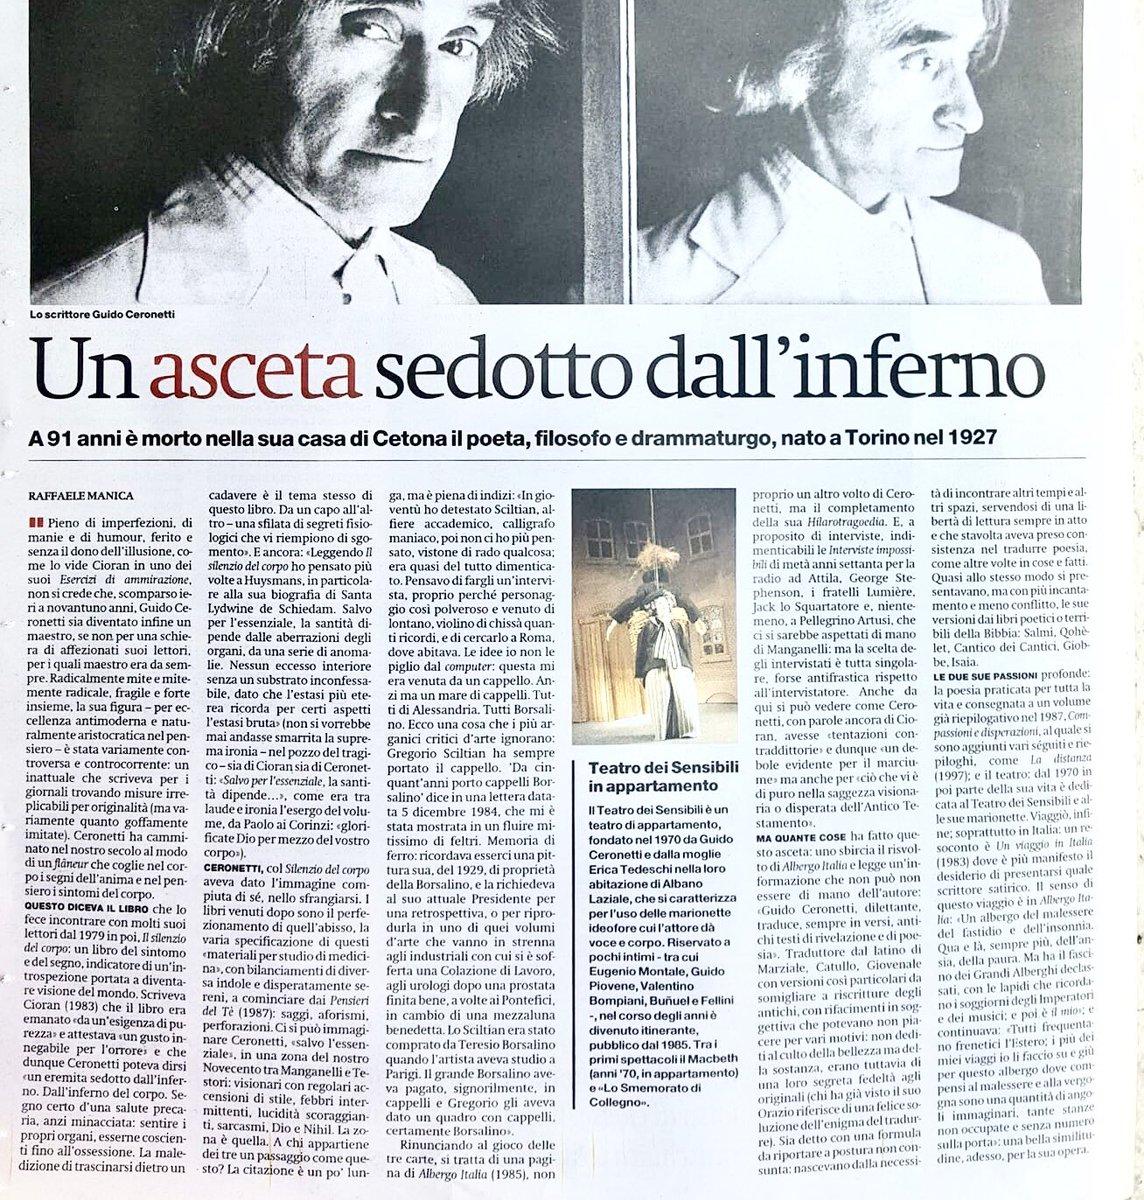 #Ceronetti Raffaele Manica sul Manifesto di oggi.  - Ukustom